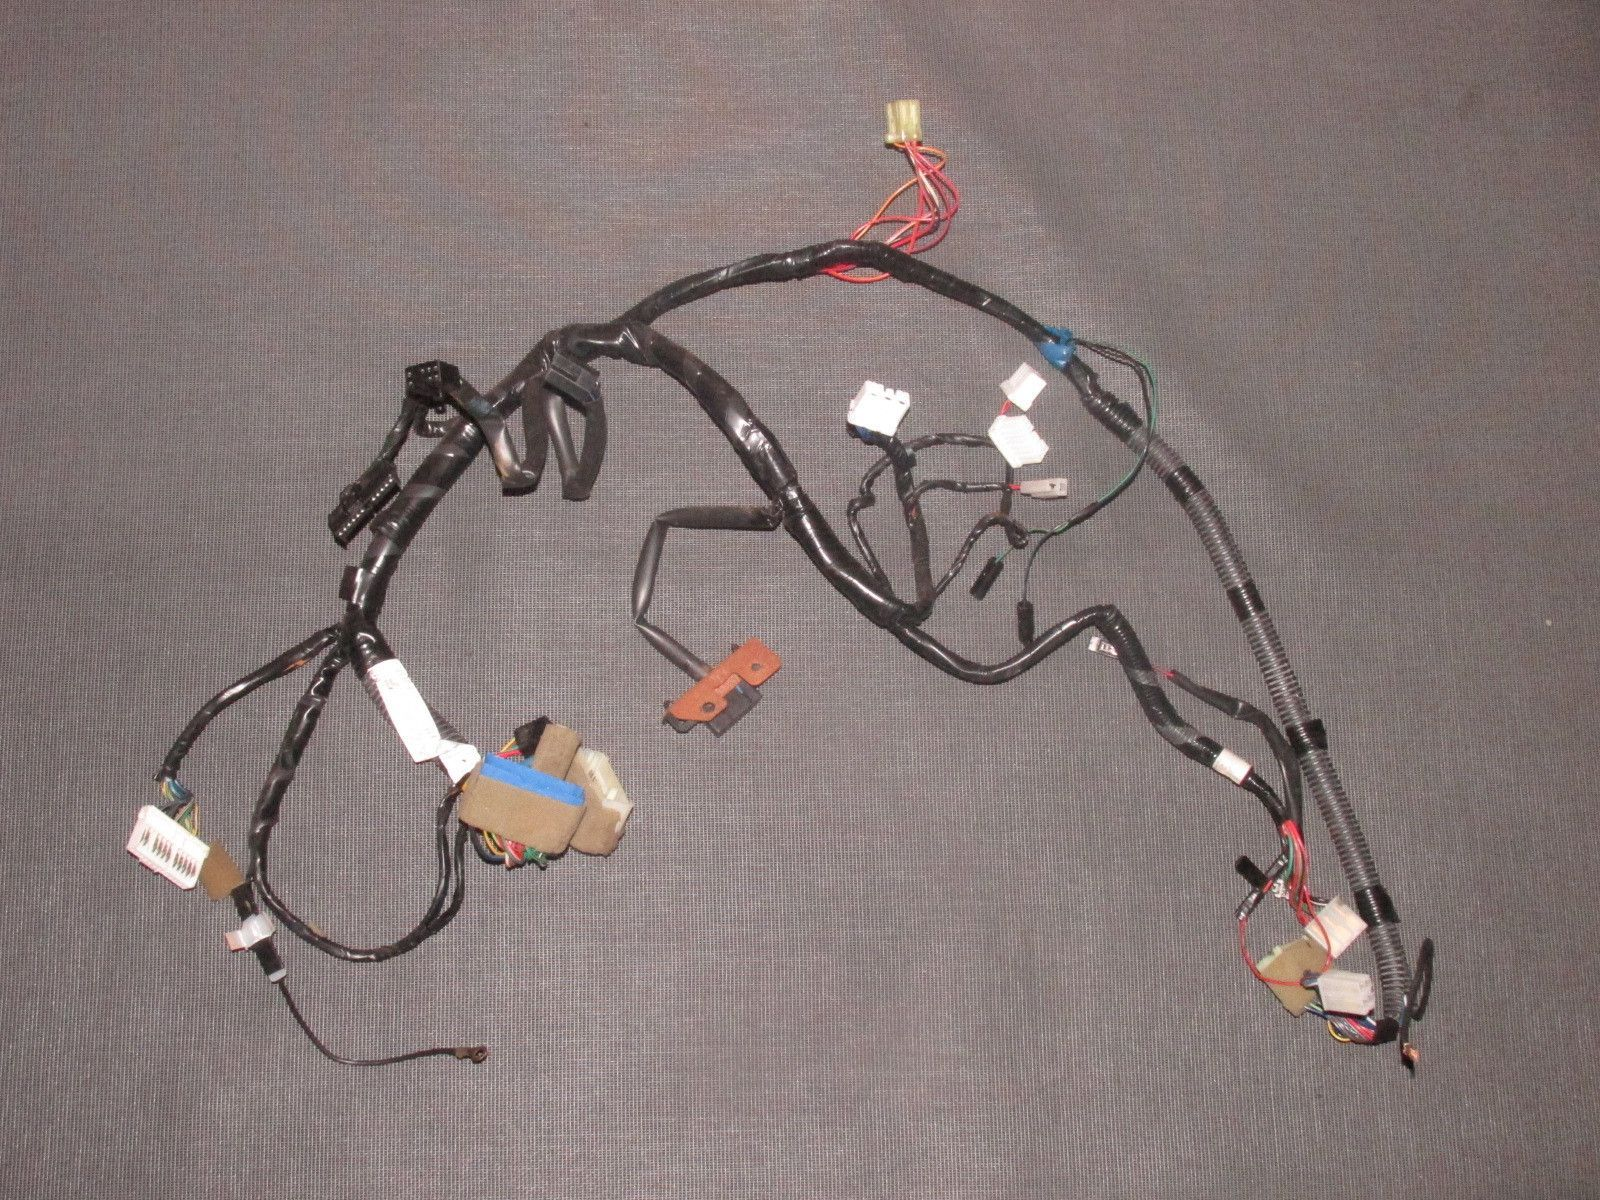 94 95 96 97 Mazda Miata Oem Speedometer Wiring Harness Autopartone